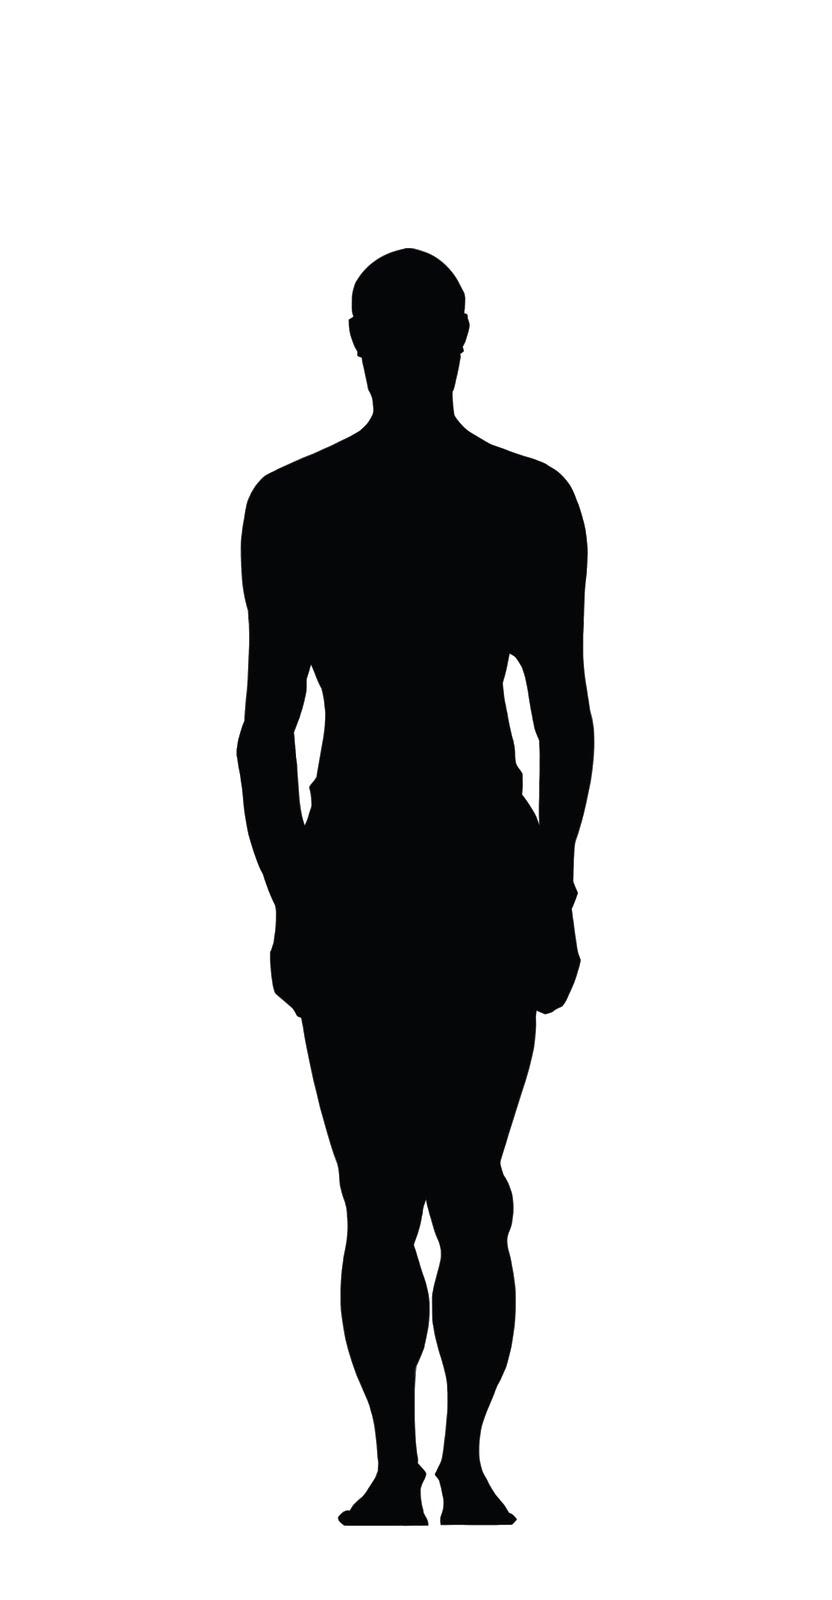 Human Body Silhouette.